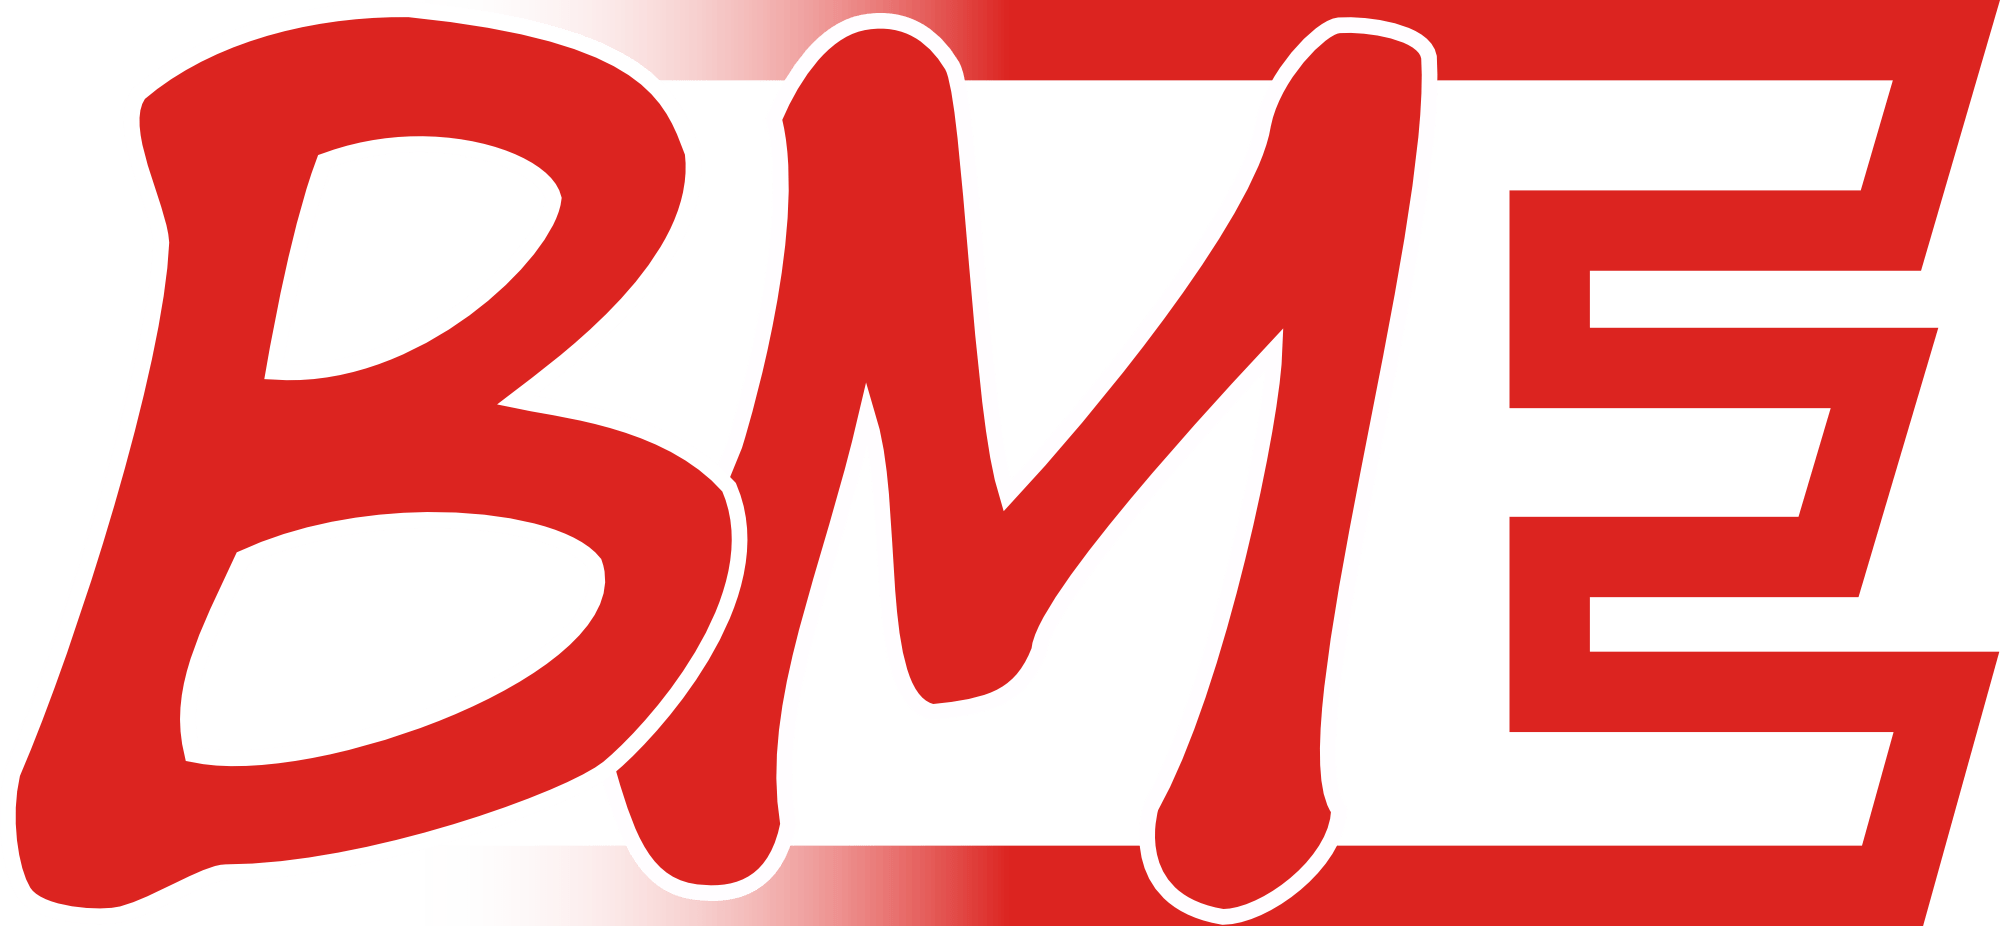 Bme Logo Biomedical Engineering Mcgill University